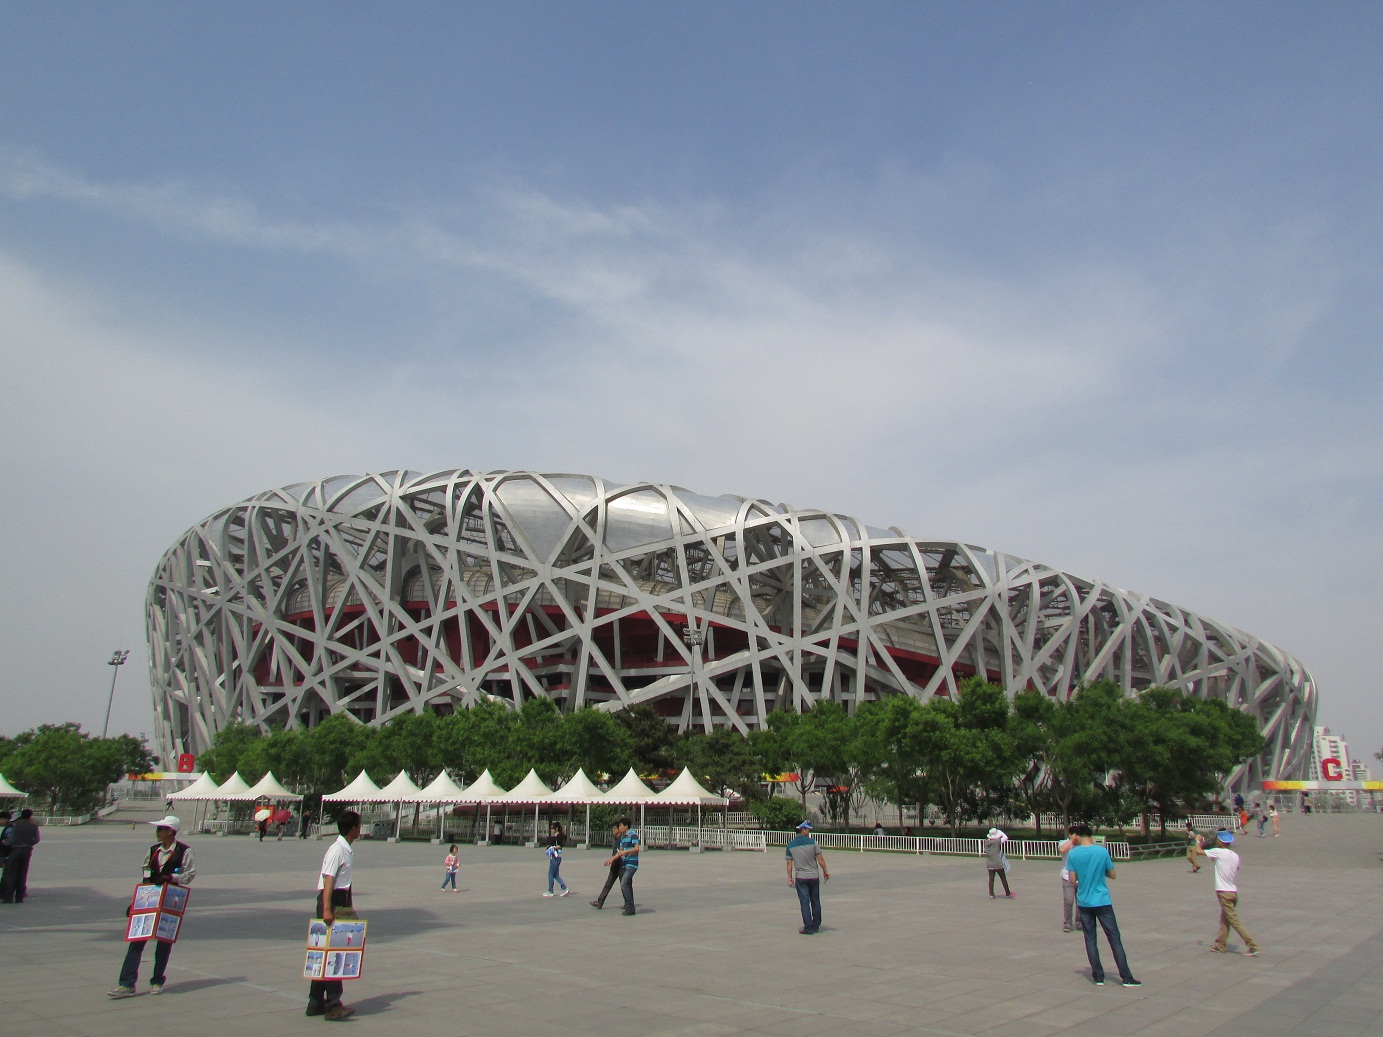 Birds Nest - Palco das olimpiadas